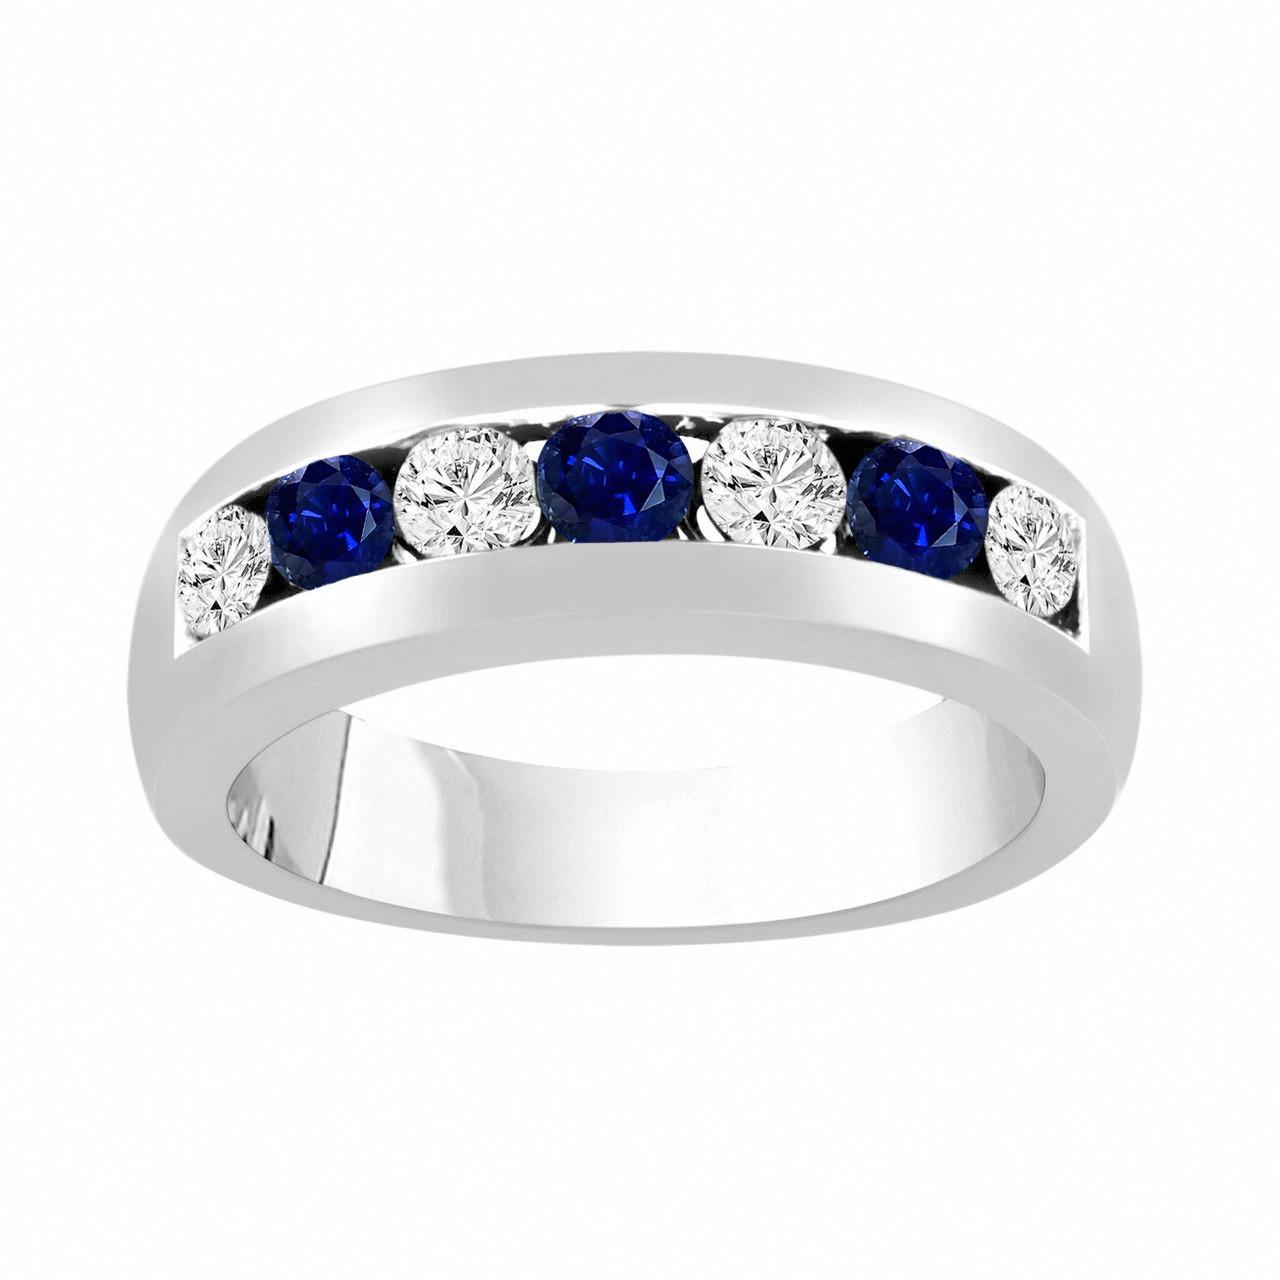 Mens Wedding Bands With Diamonds.Alternating Sapphire And Diamonds Wedding Band Blue Sapphire Mens Wedding Ring Unisex Anniversary Ring 0 81 Carat 14k White Gold 6 Mm